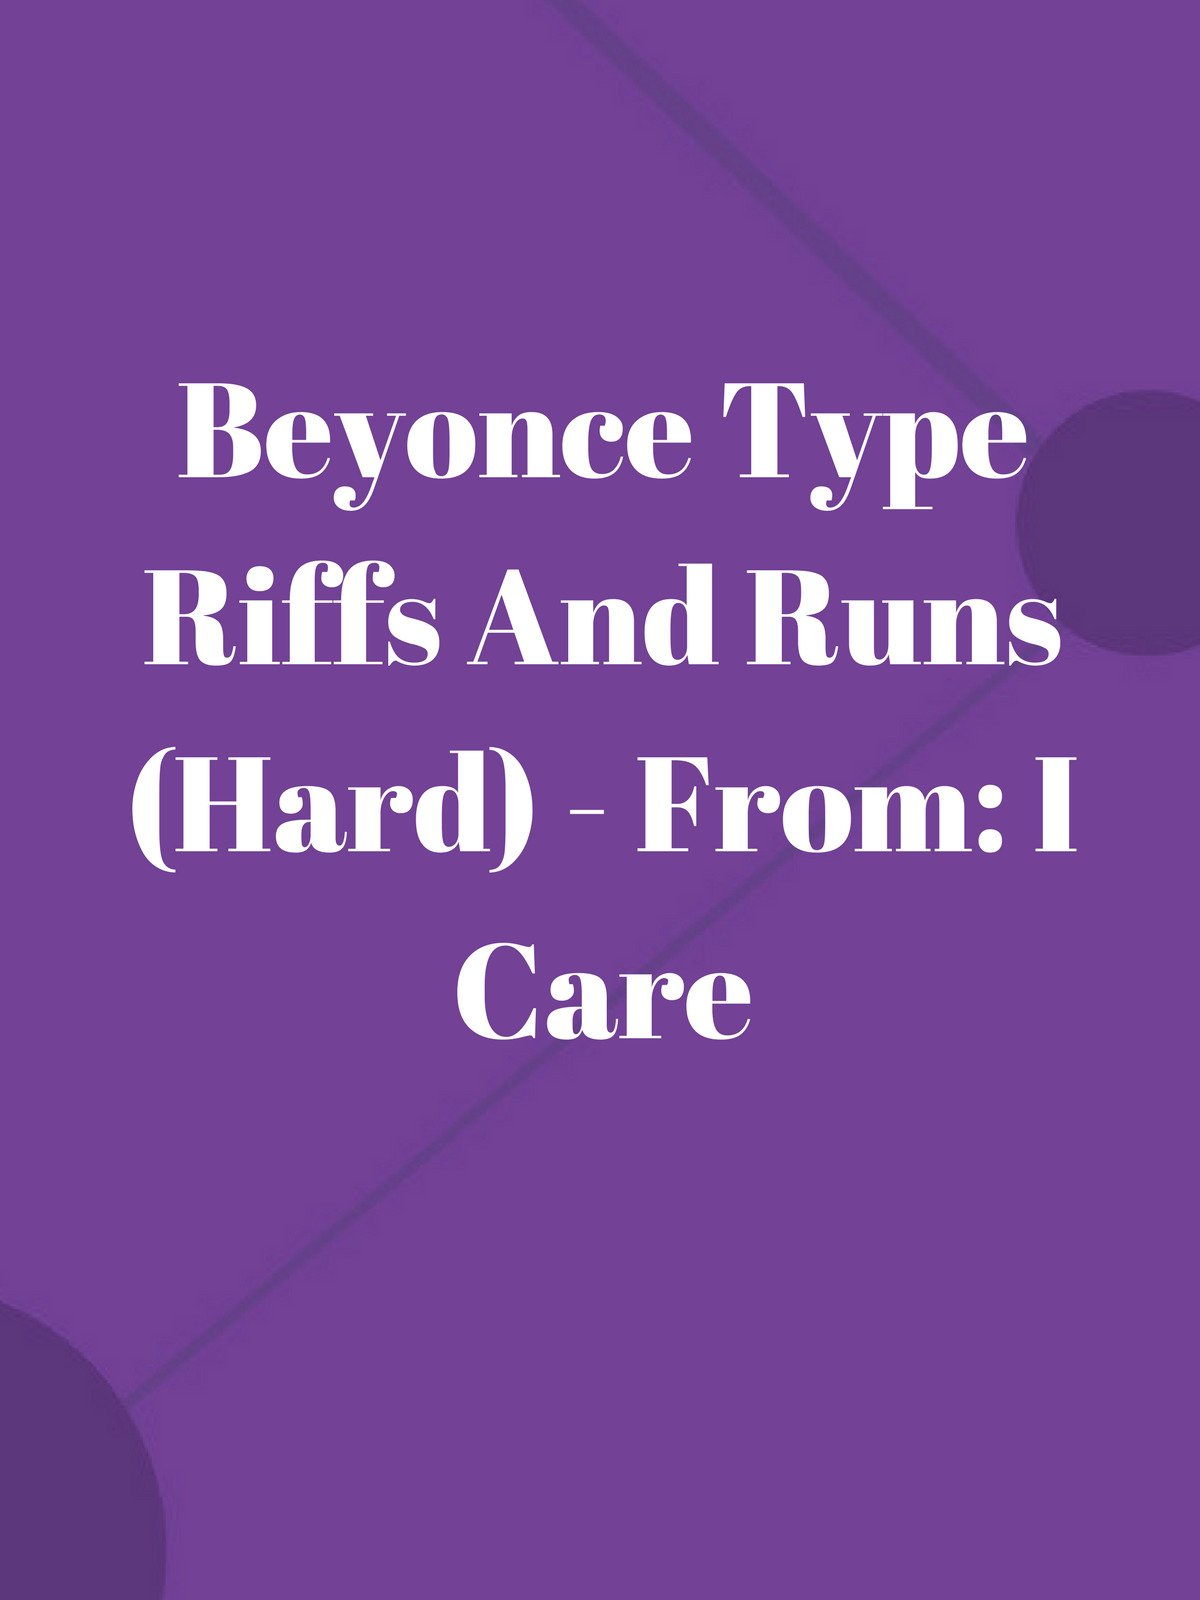 Beyonce Type Riffs And Runs (Hard)